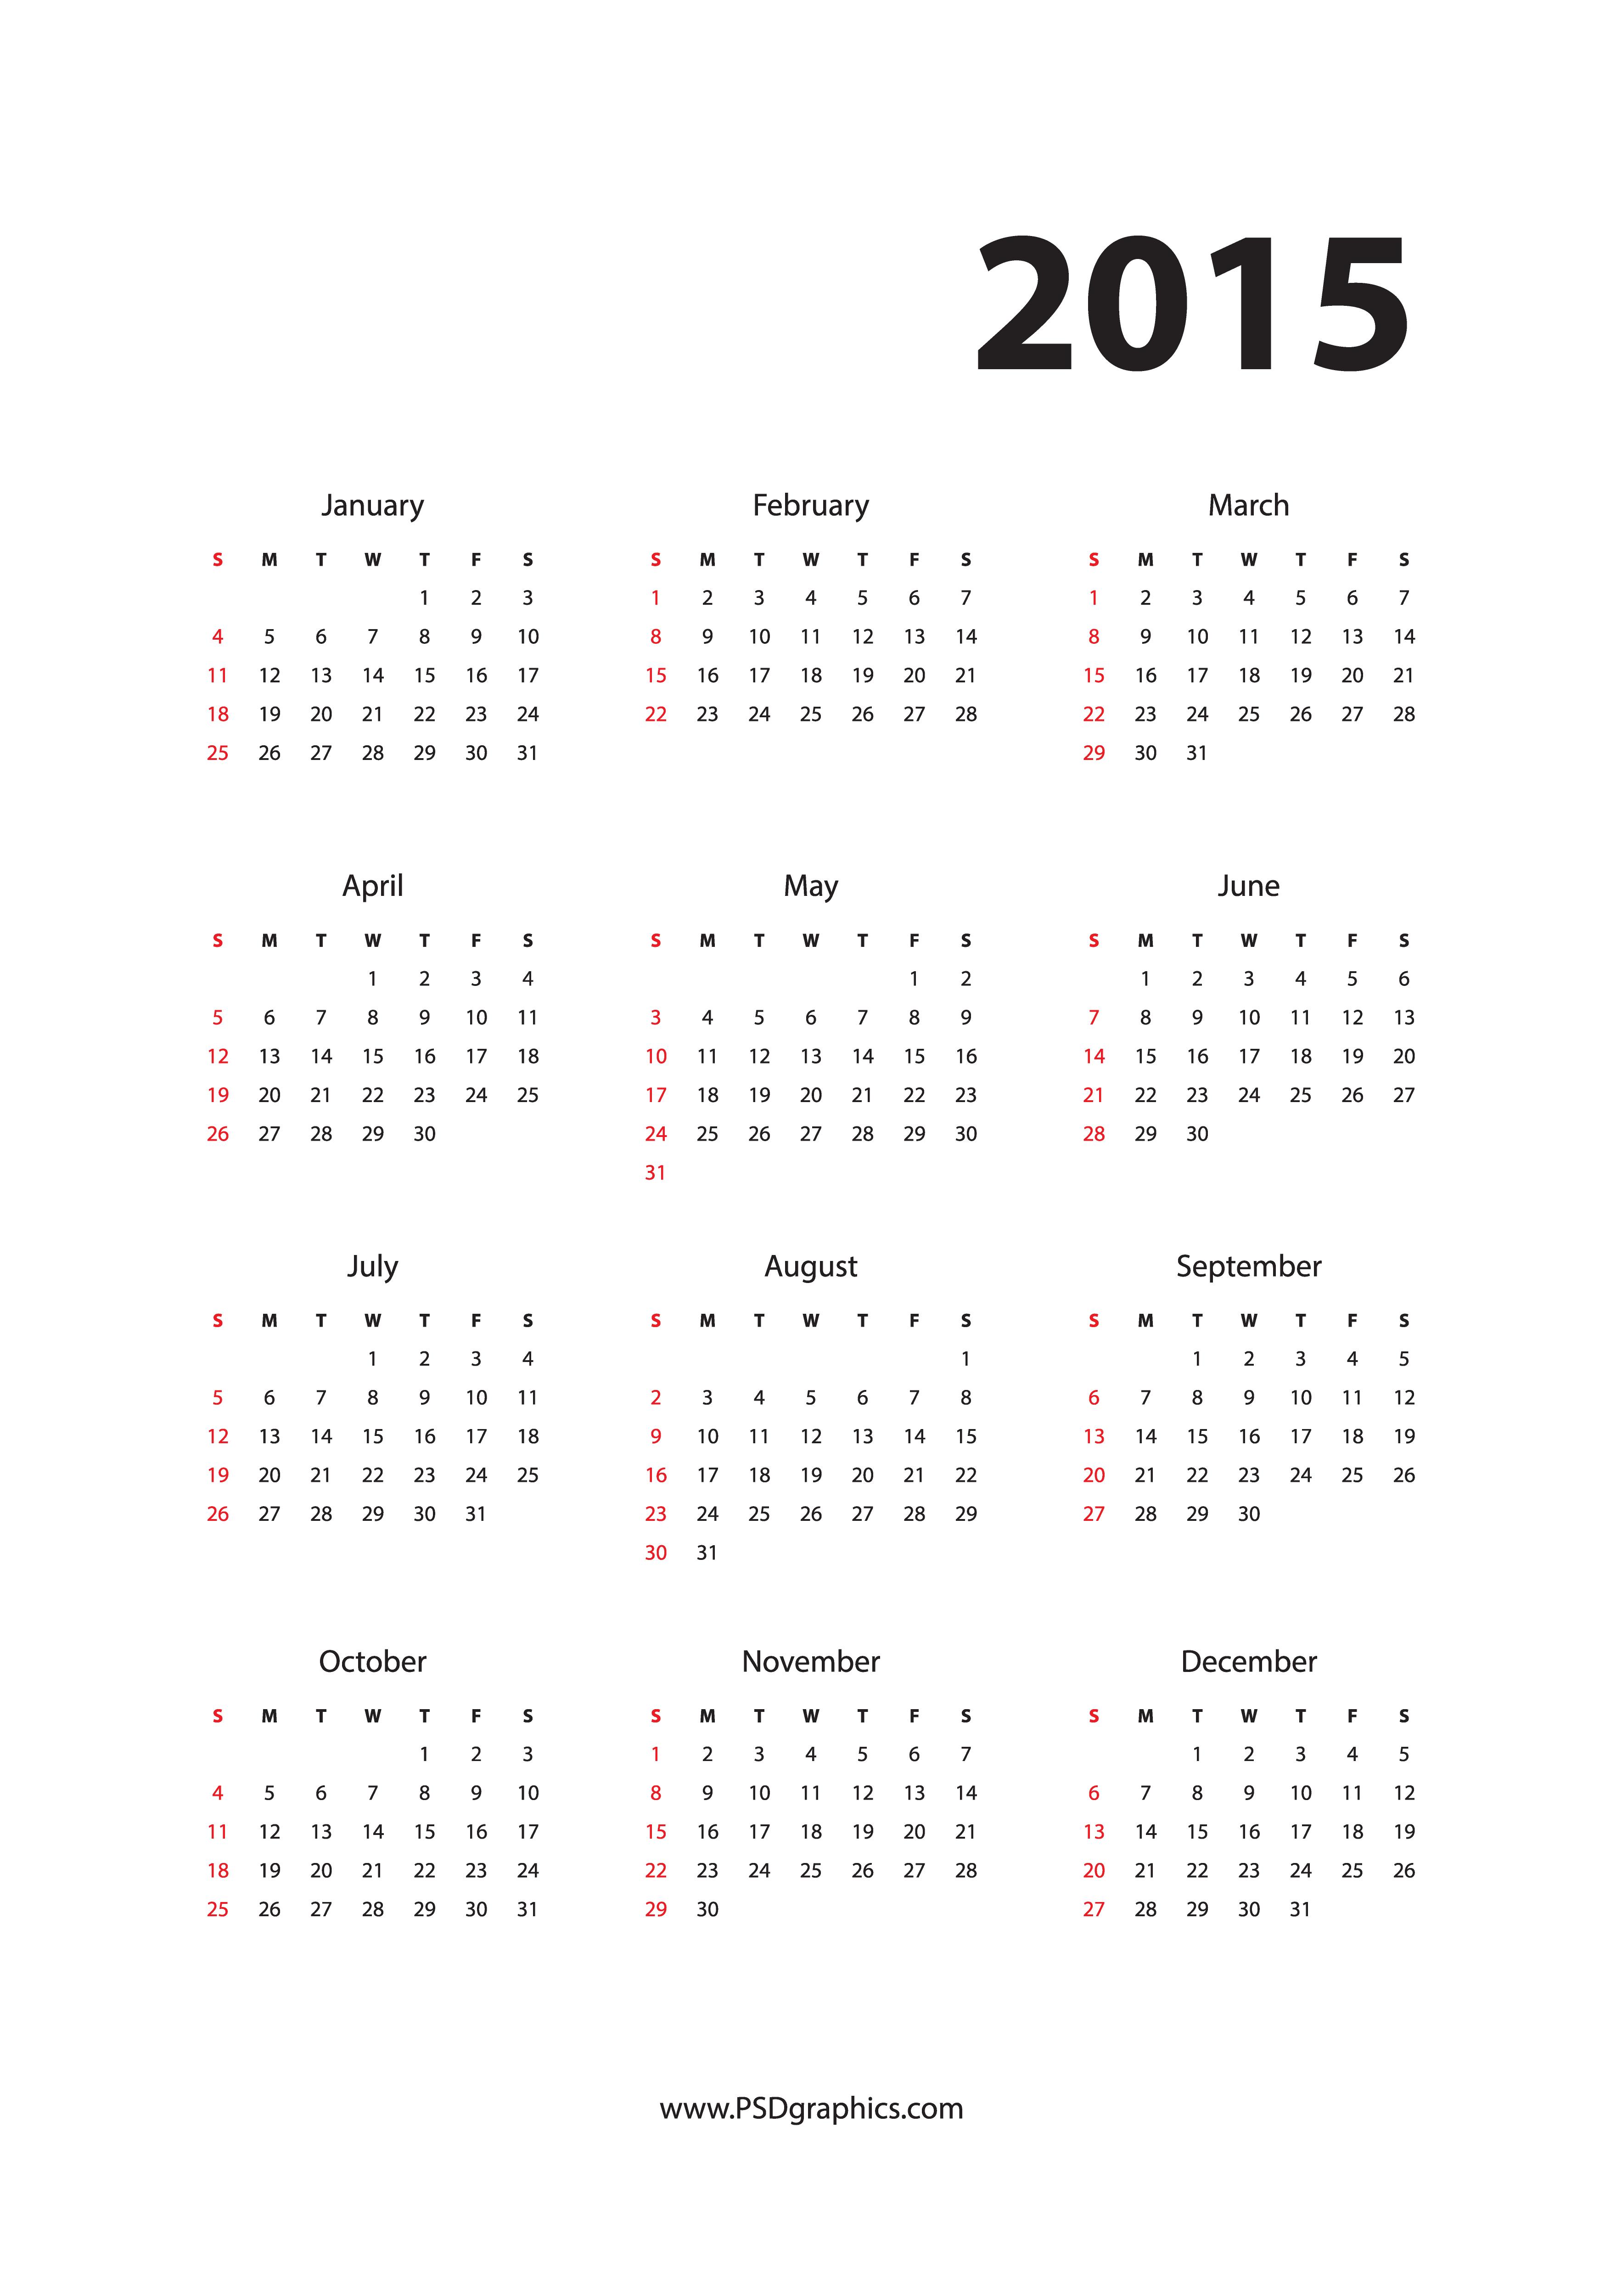 year 2015 calendar png 203kb